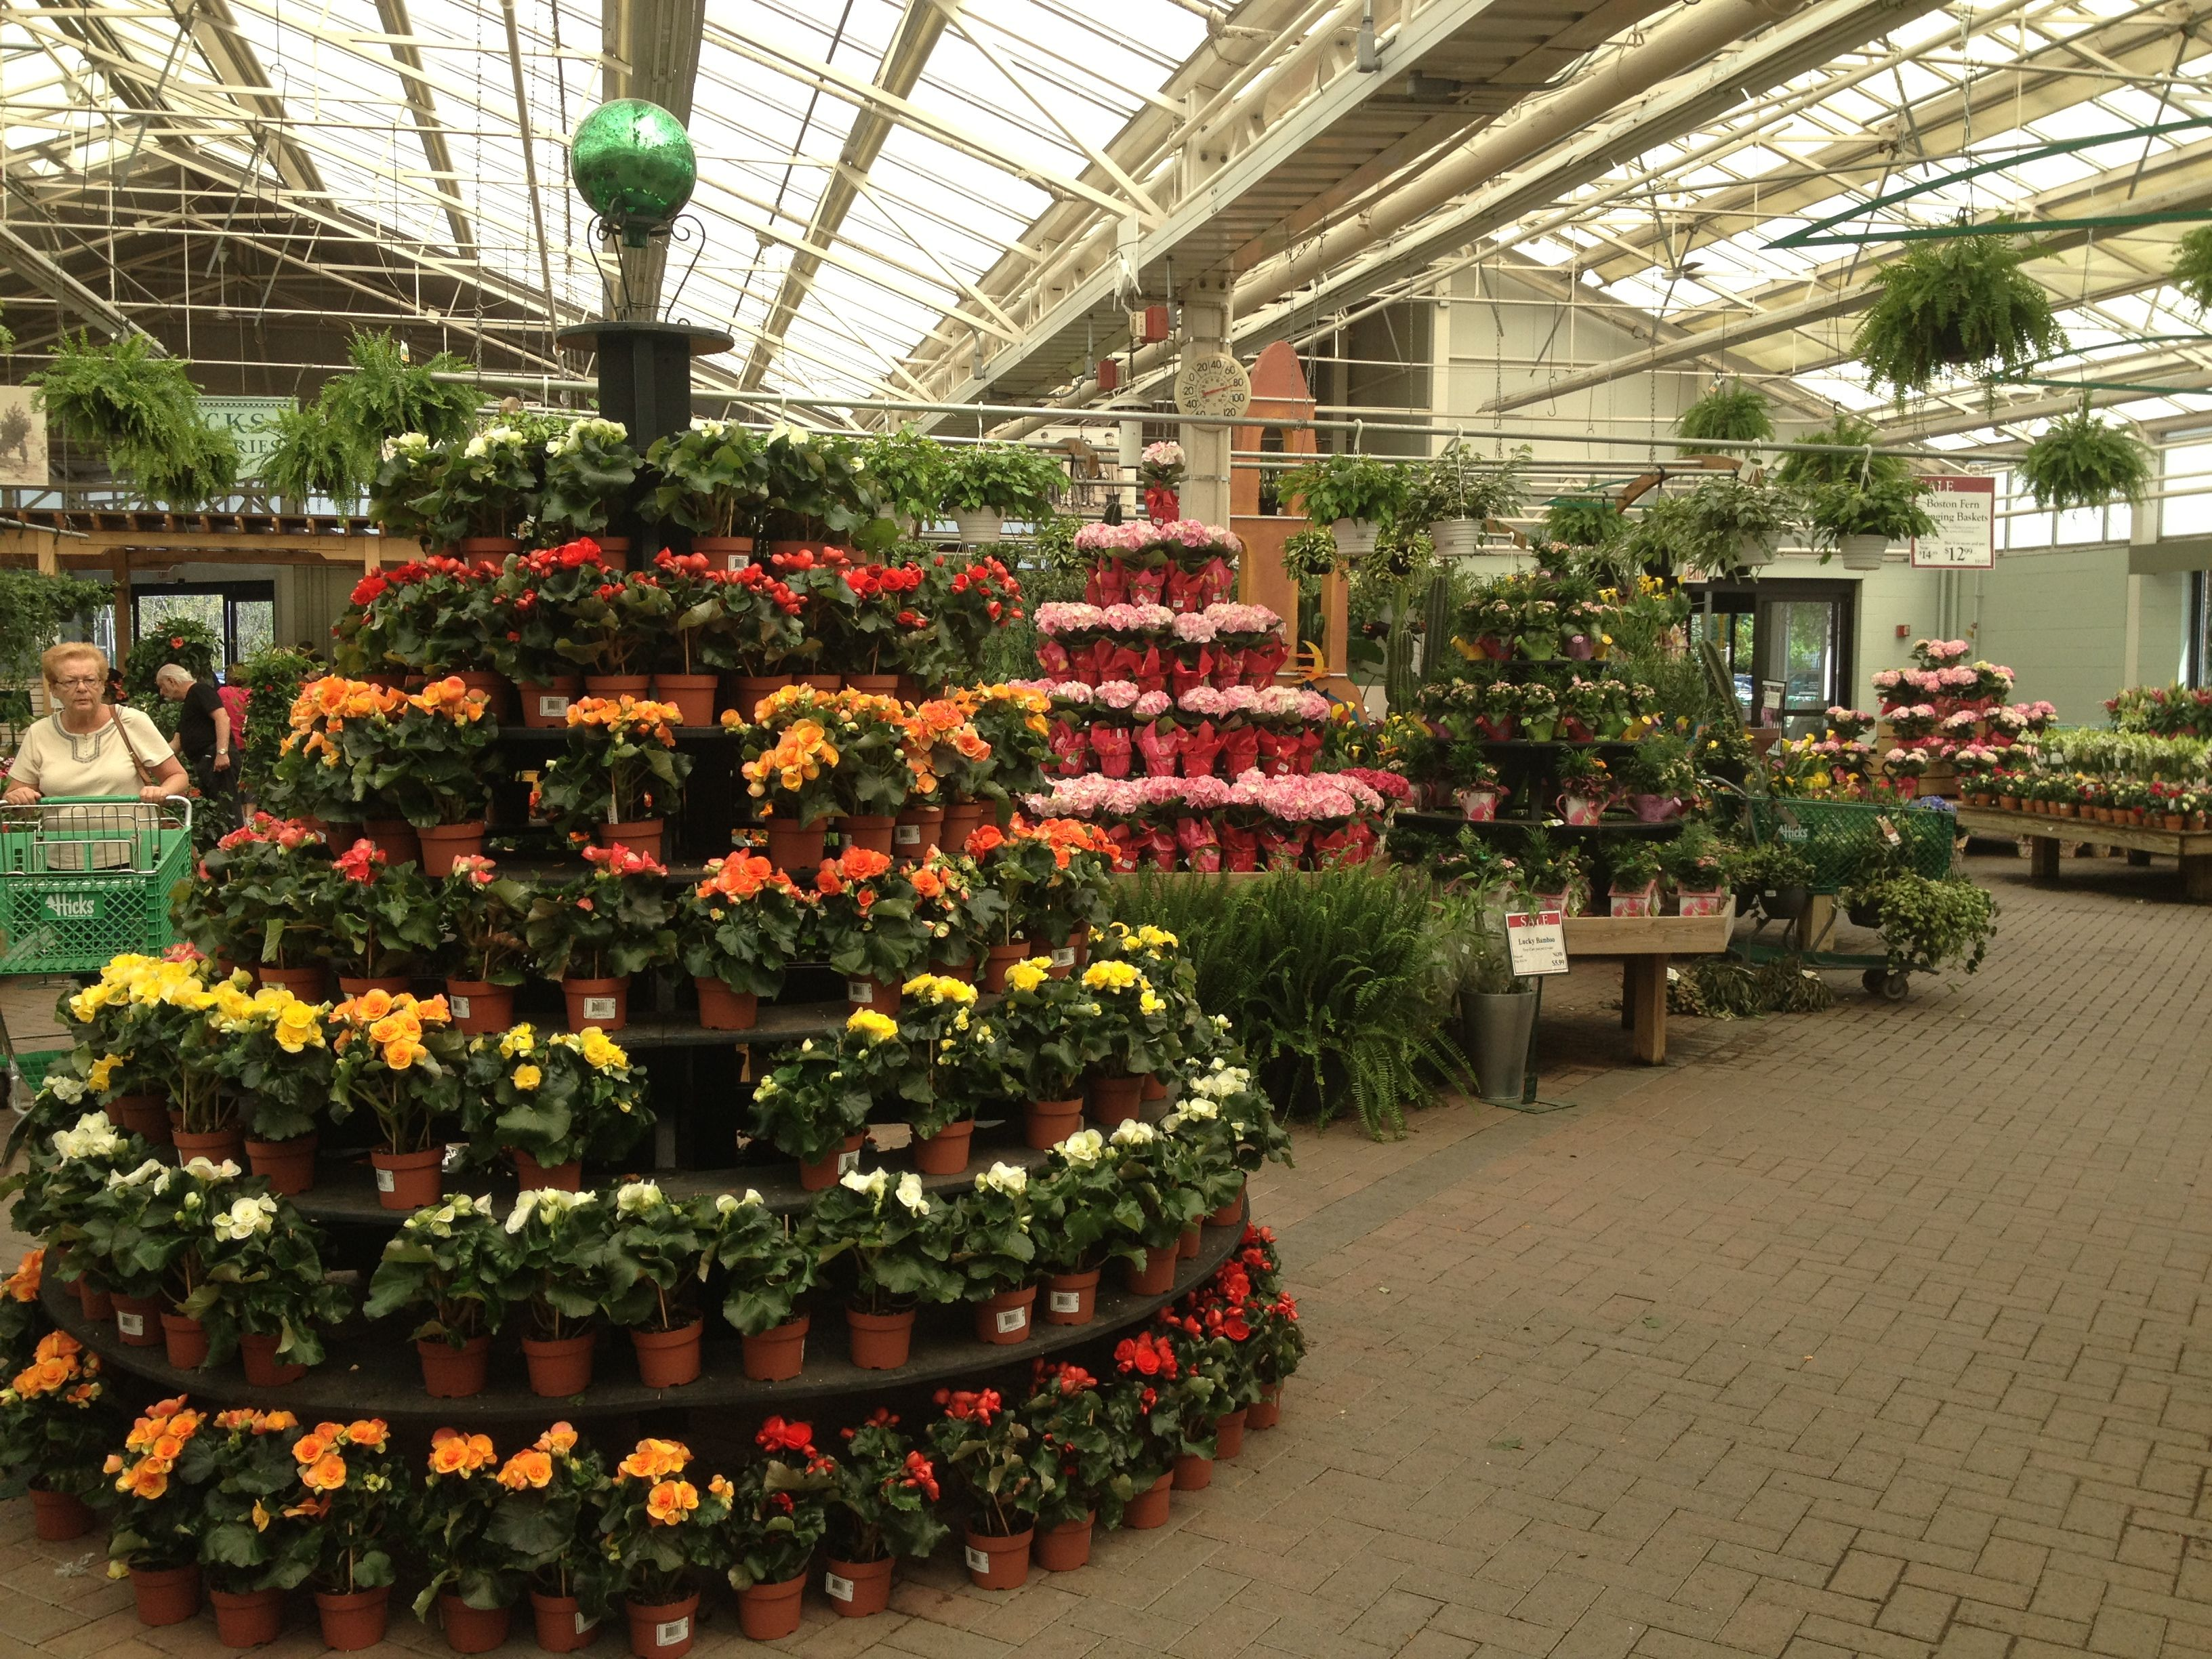 The Maiin Greenhouse at Hicks Nurseries. Garden center